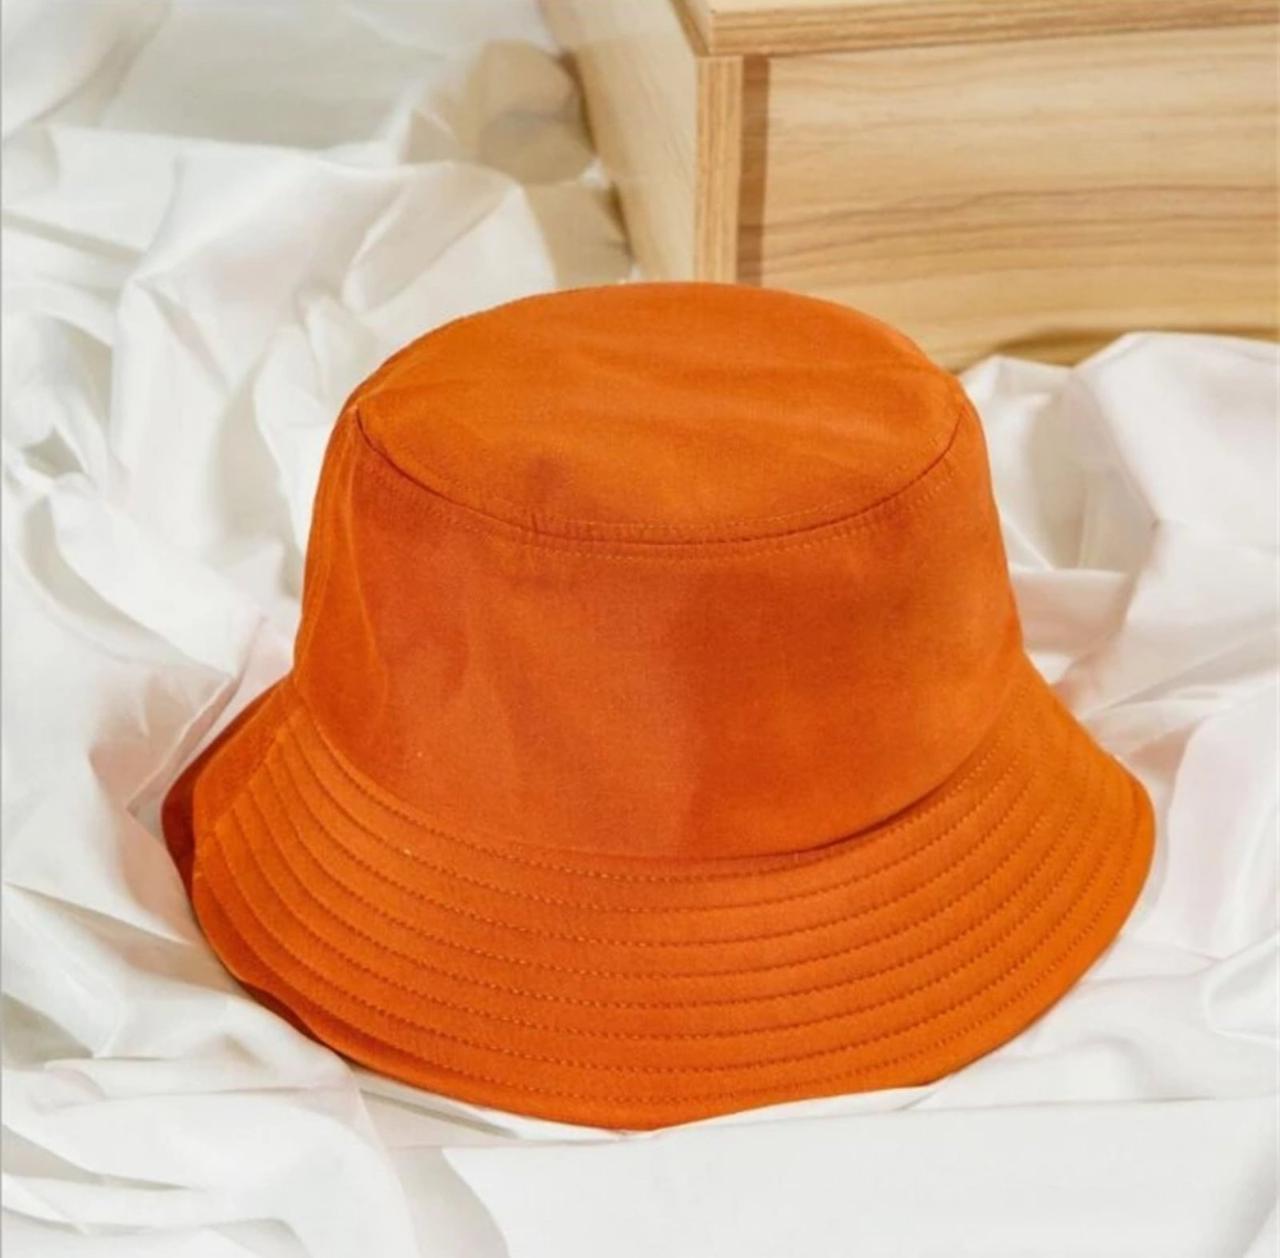 Панама Оранжевая 2, Унисекс